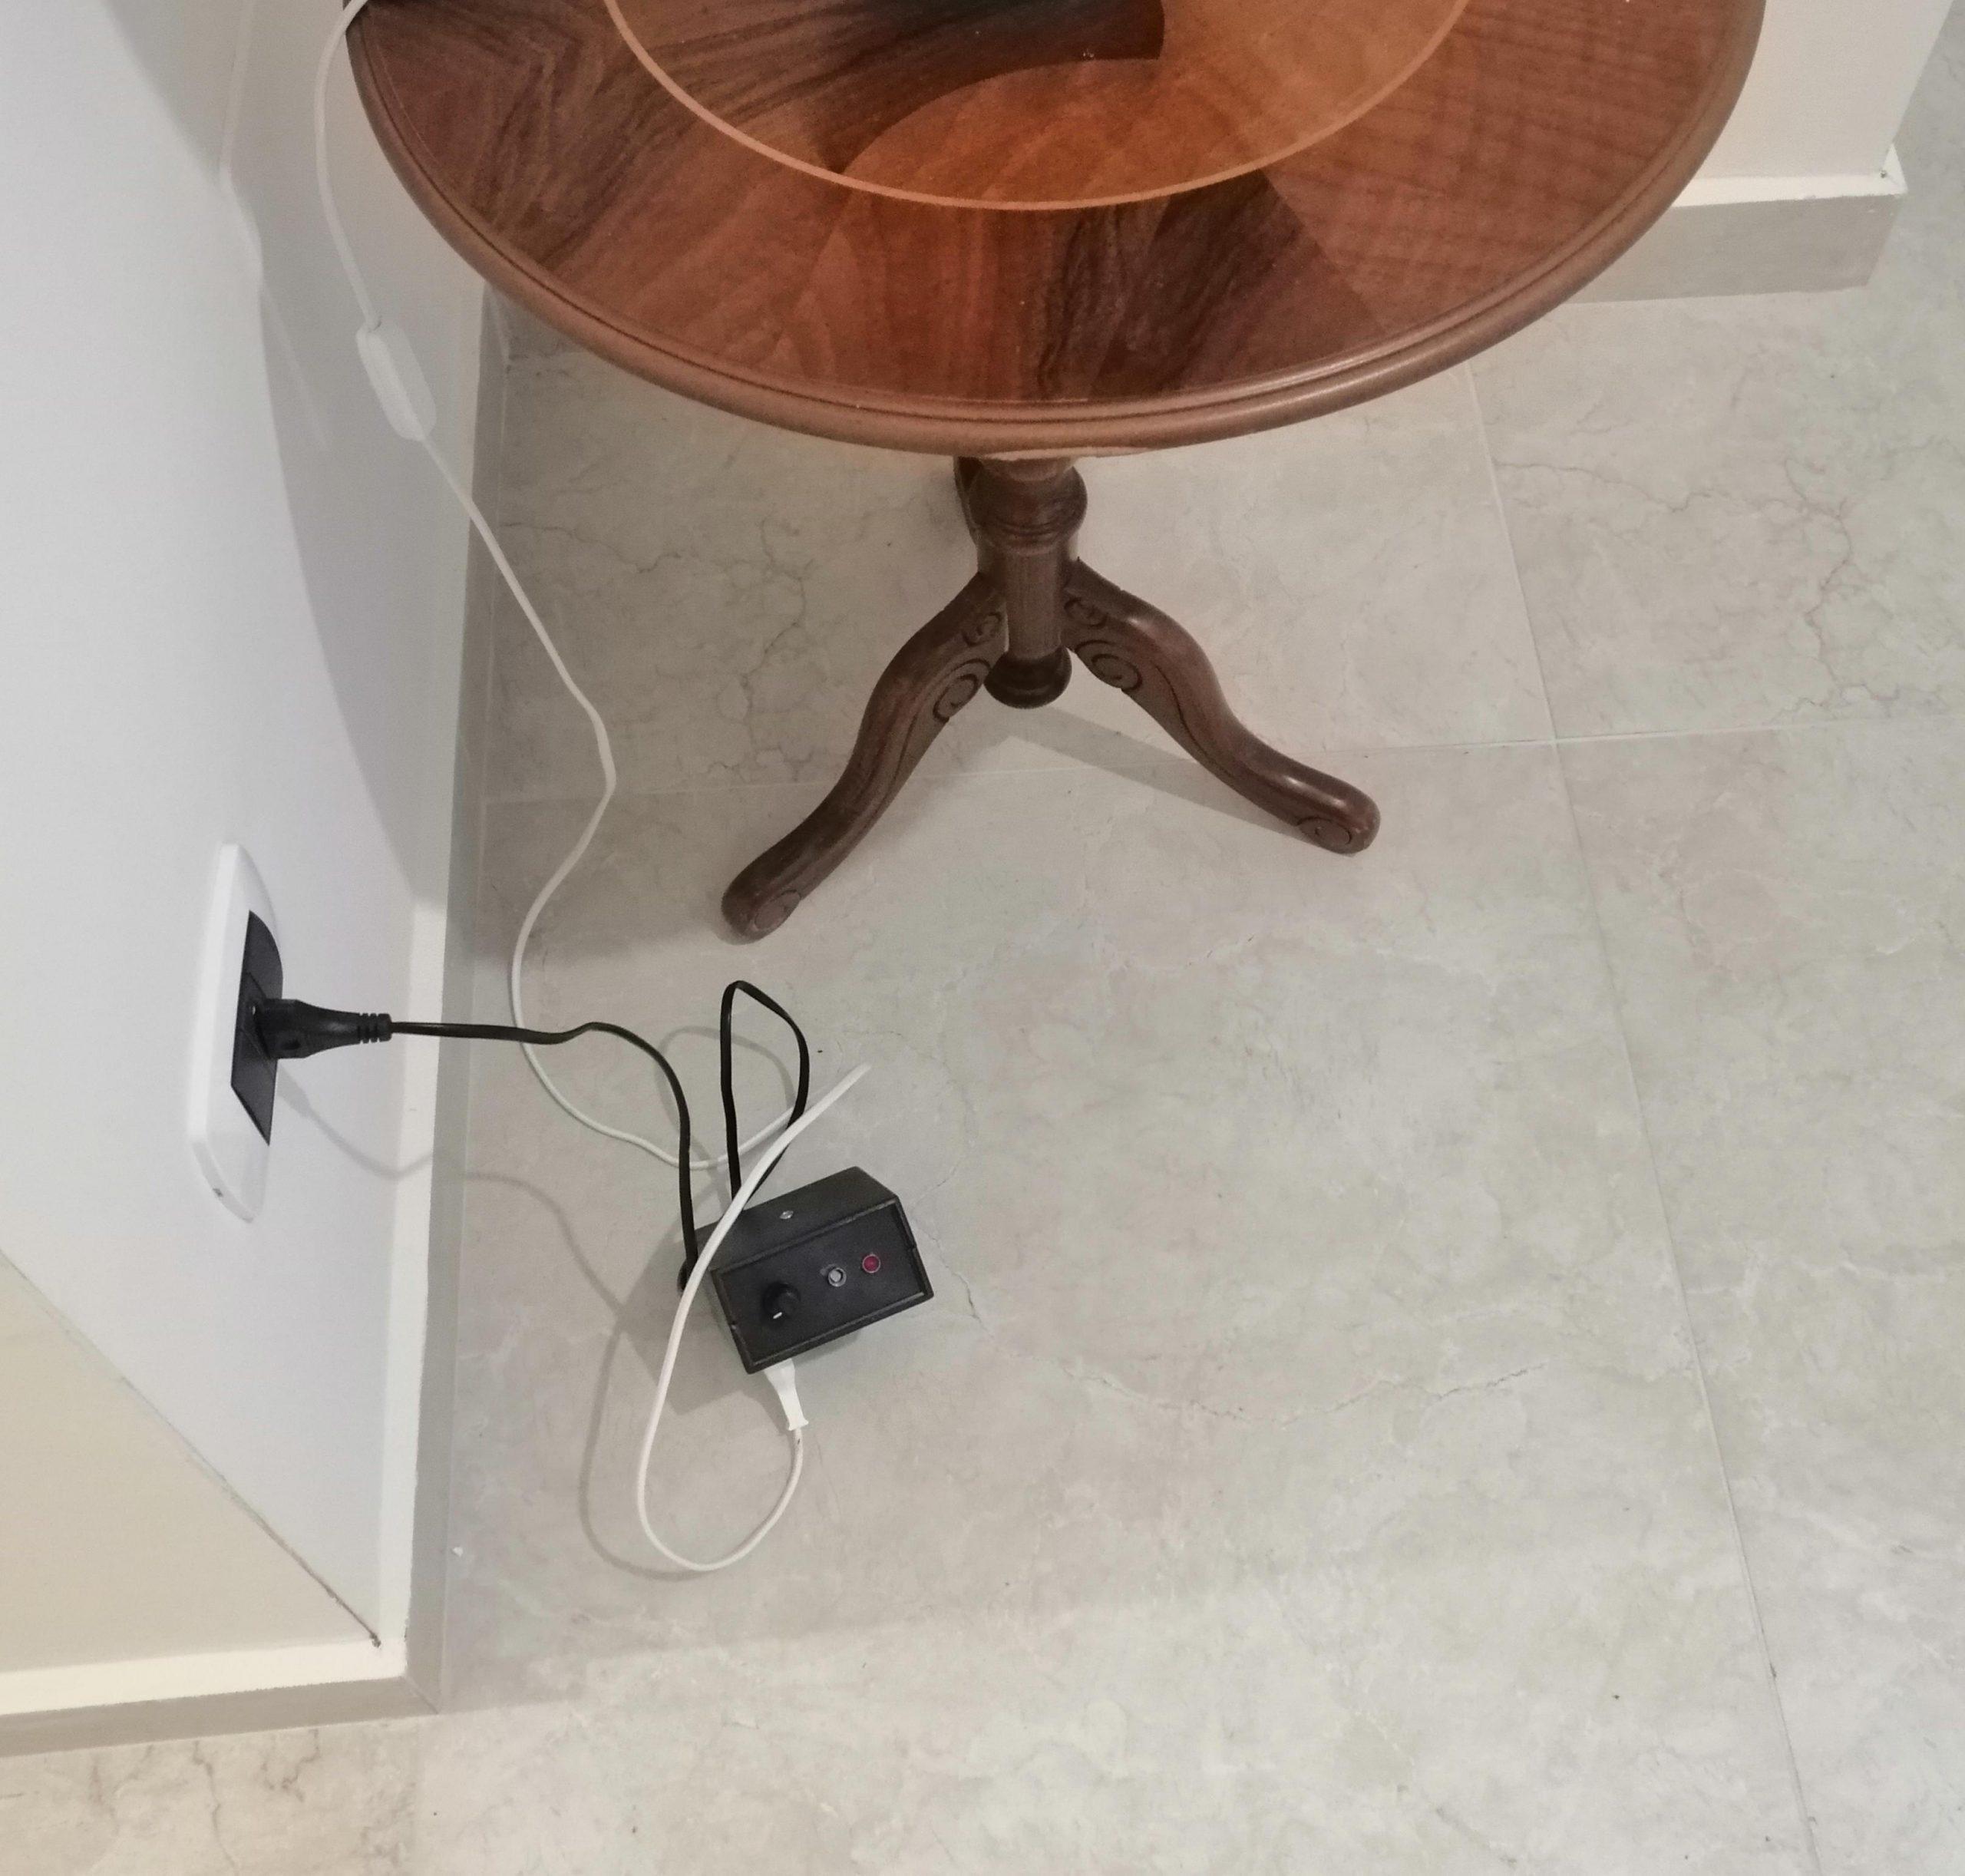 Lampada Spenta - Luce ambientale sufficiente - Interruttore crepuscolare OFF